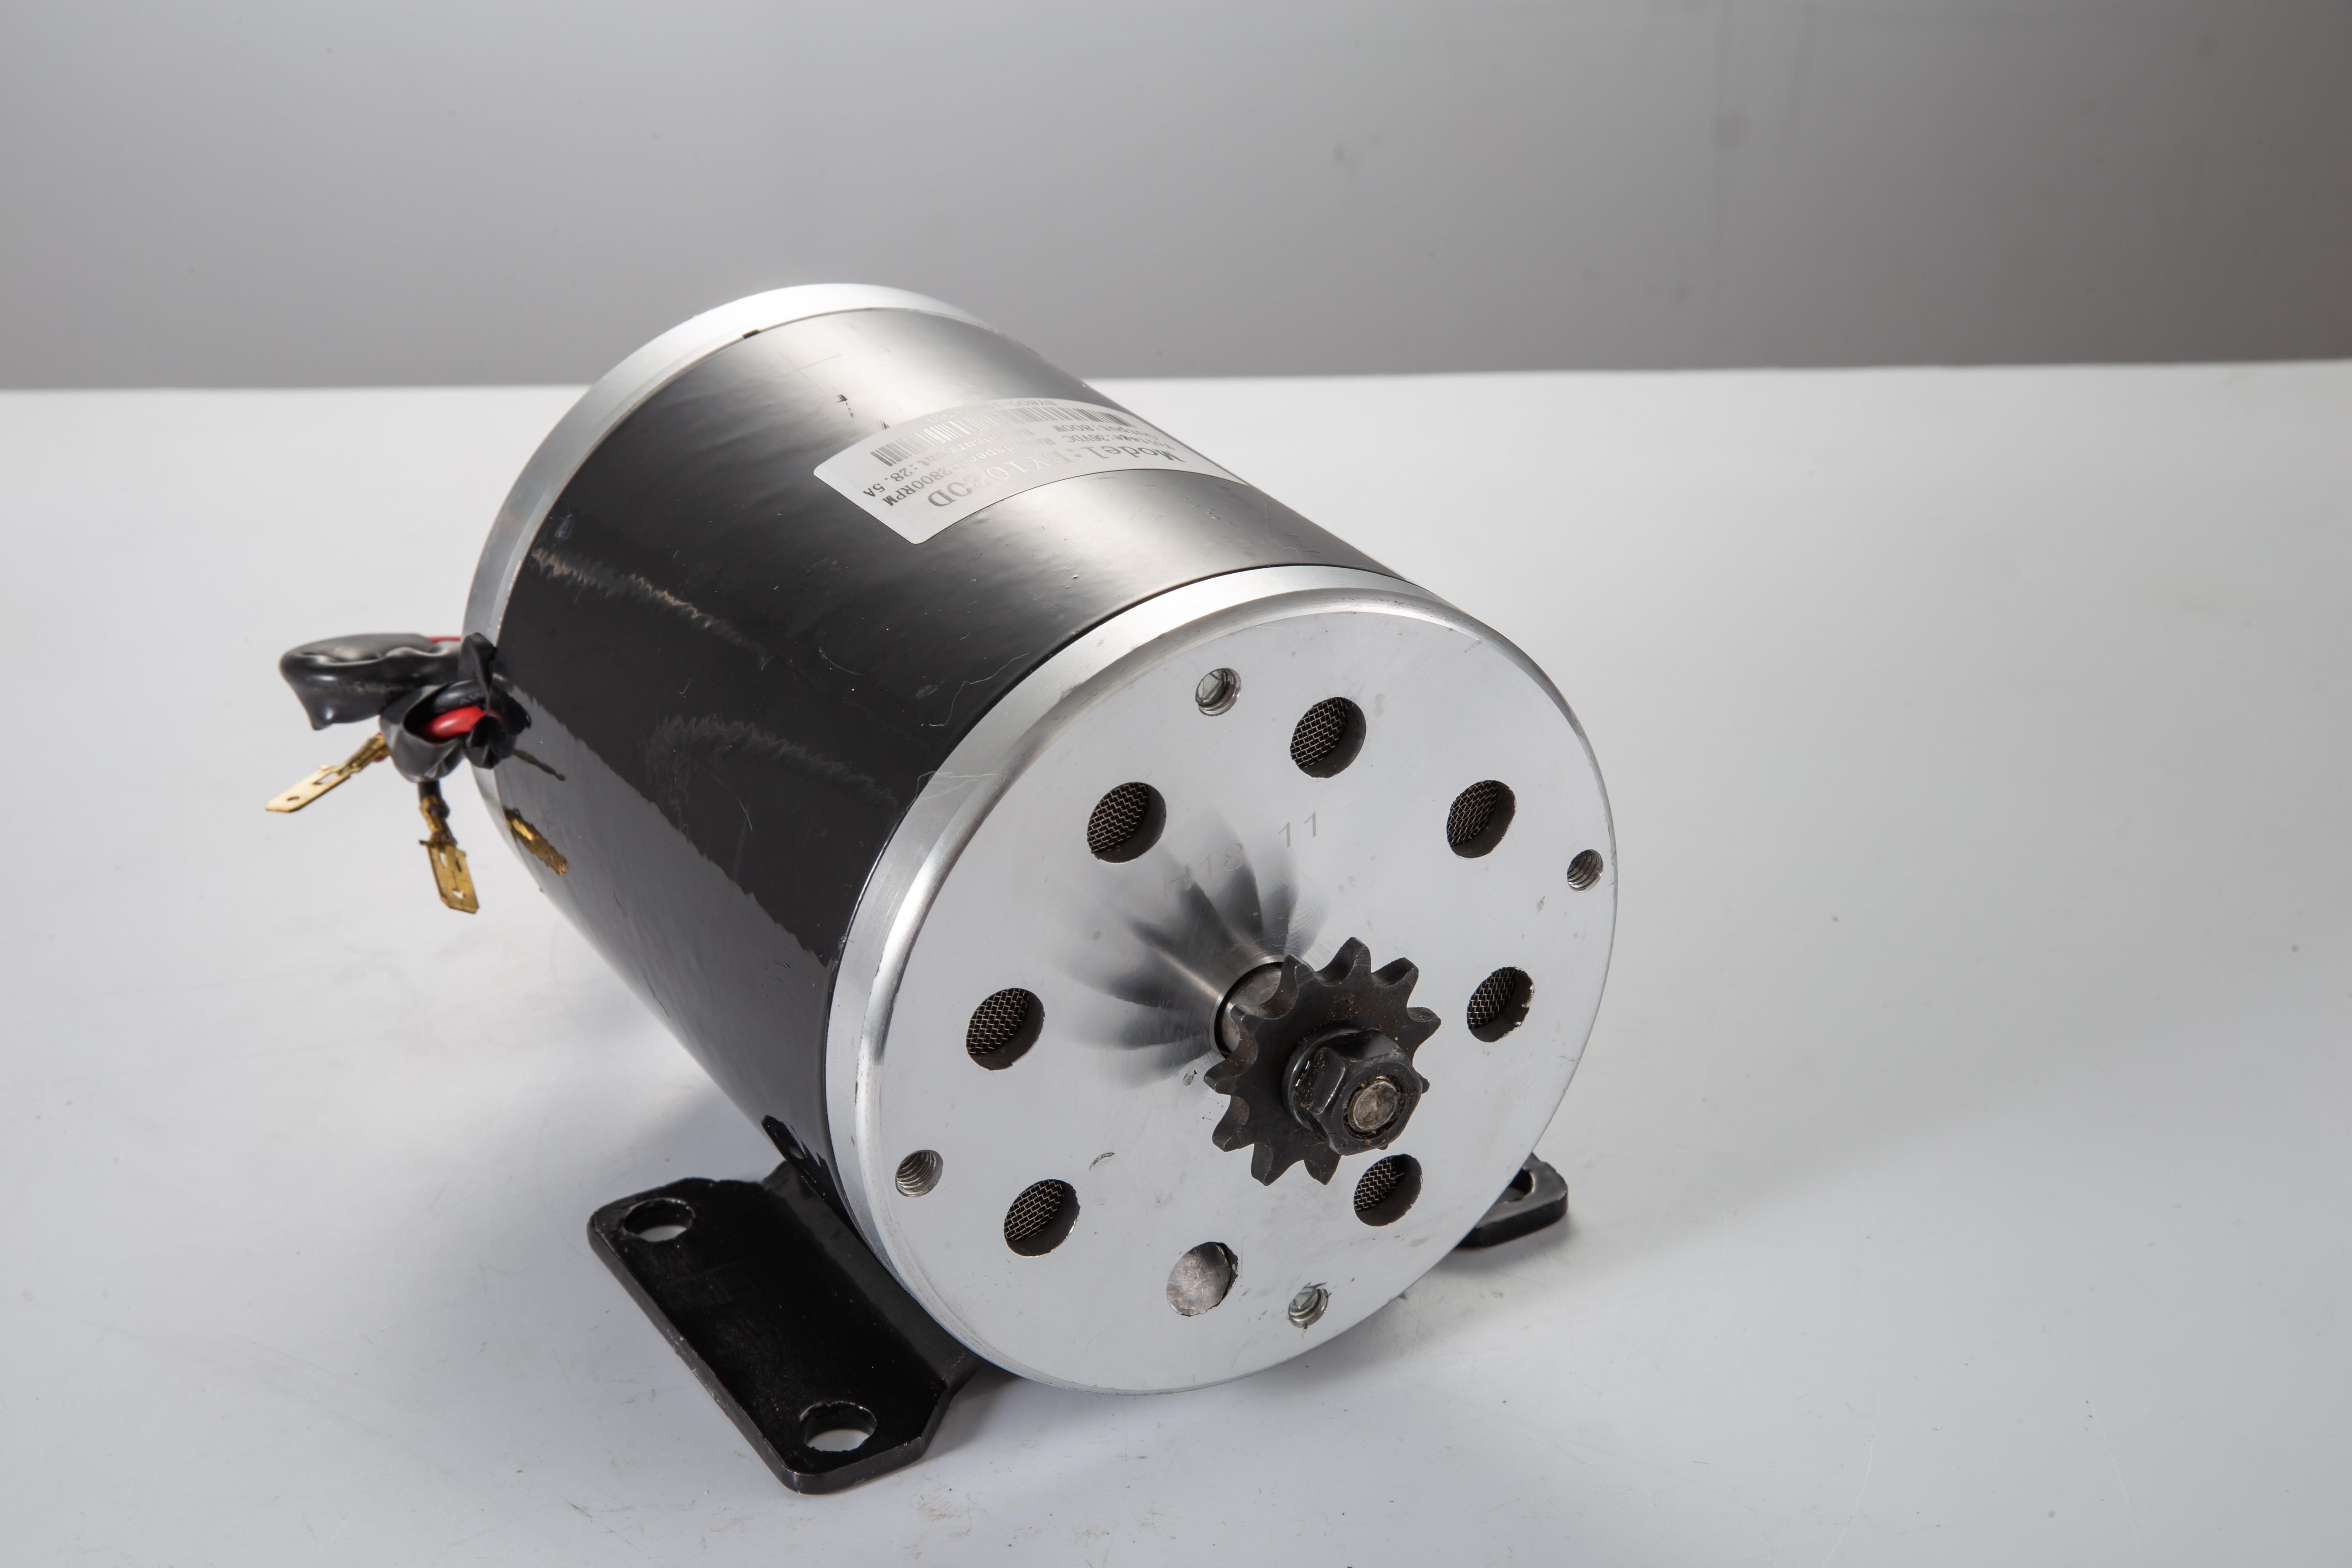 36v-Electric-Motor-controller-throttle-kit-f-Scooter-E-Scooter-ATV-Permanent thumbnail 158